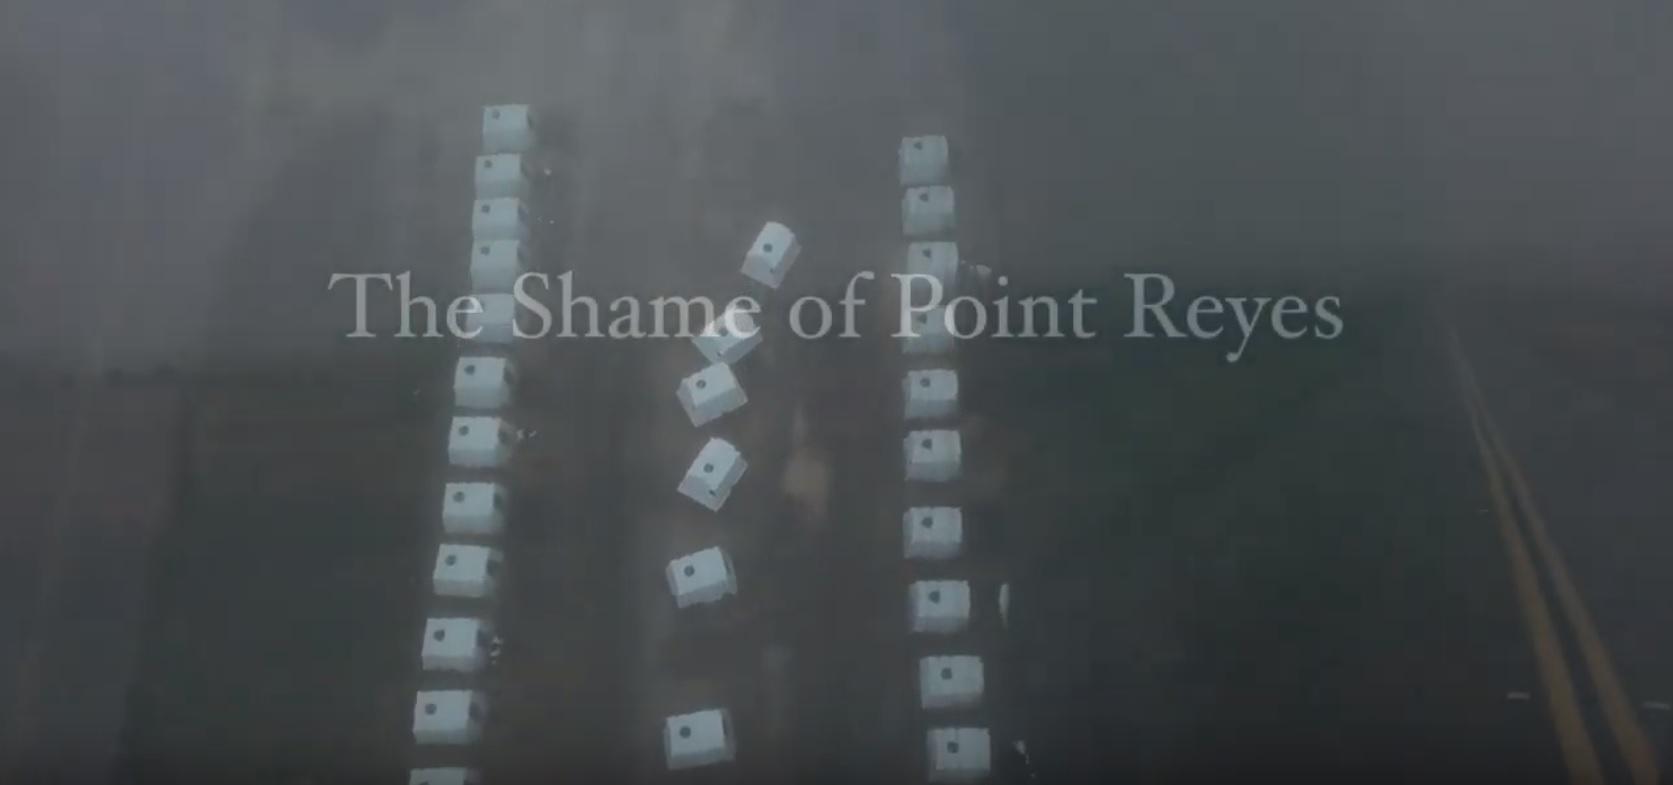 The Shame of Point Reyes.jpg